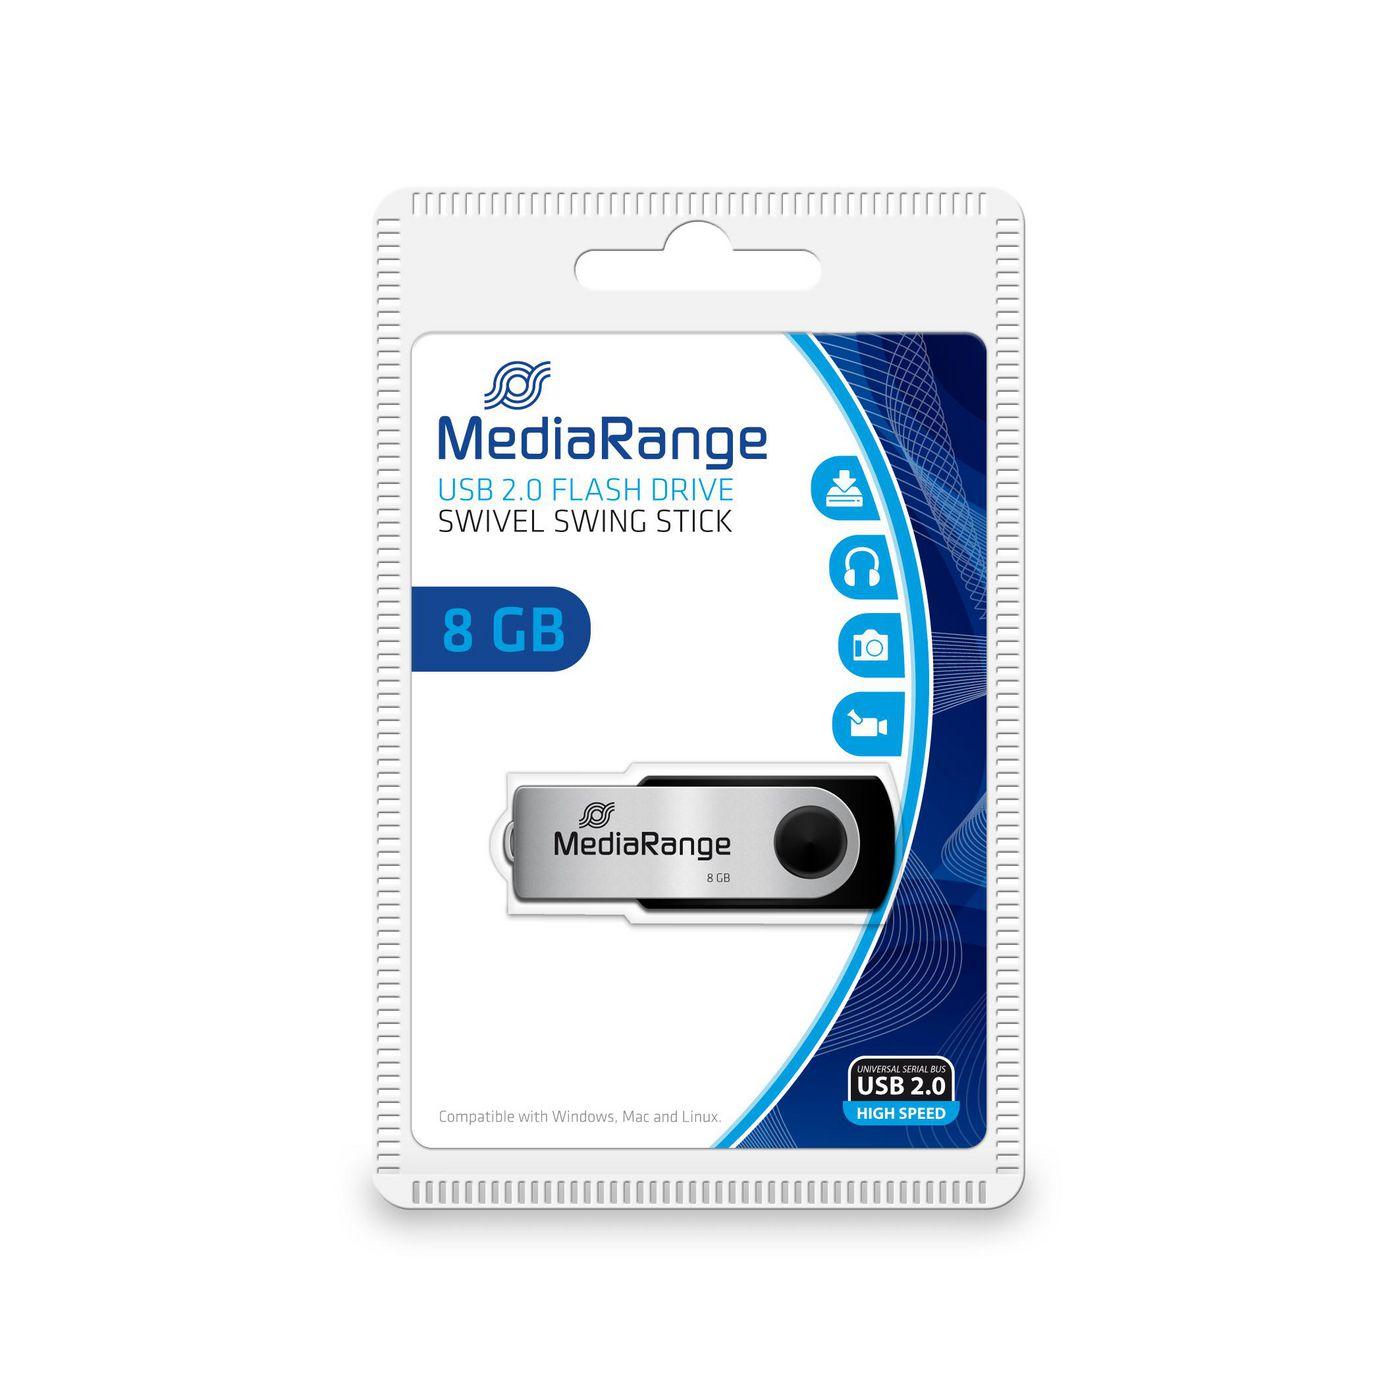 MR908 8GB MediaRange USB 2.0 Flexi